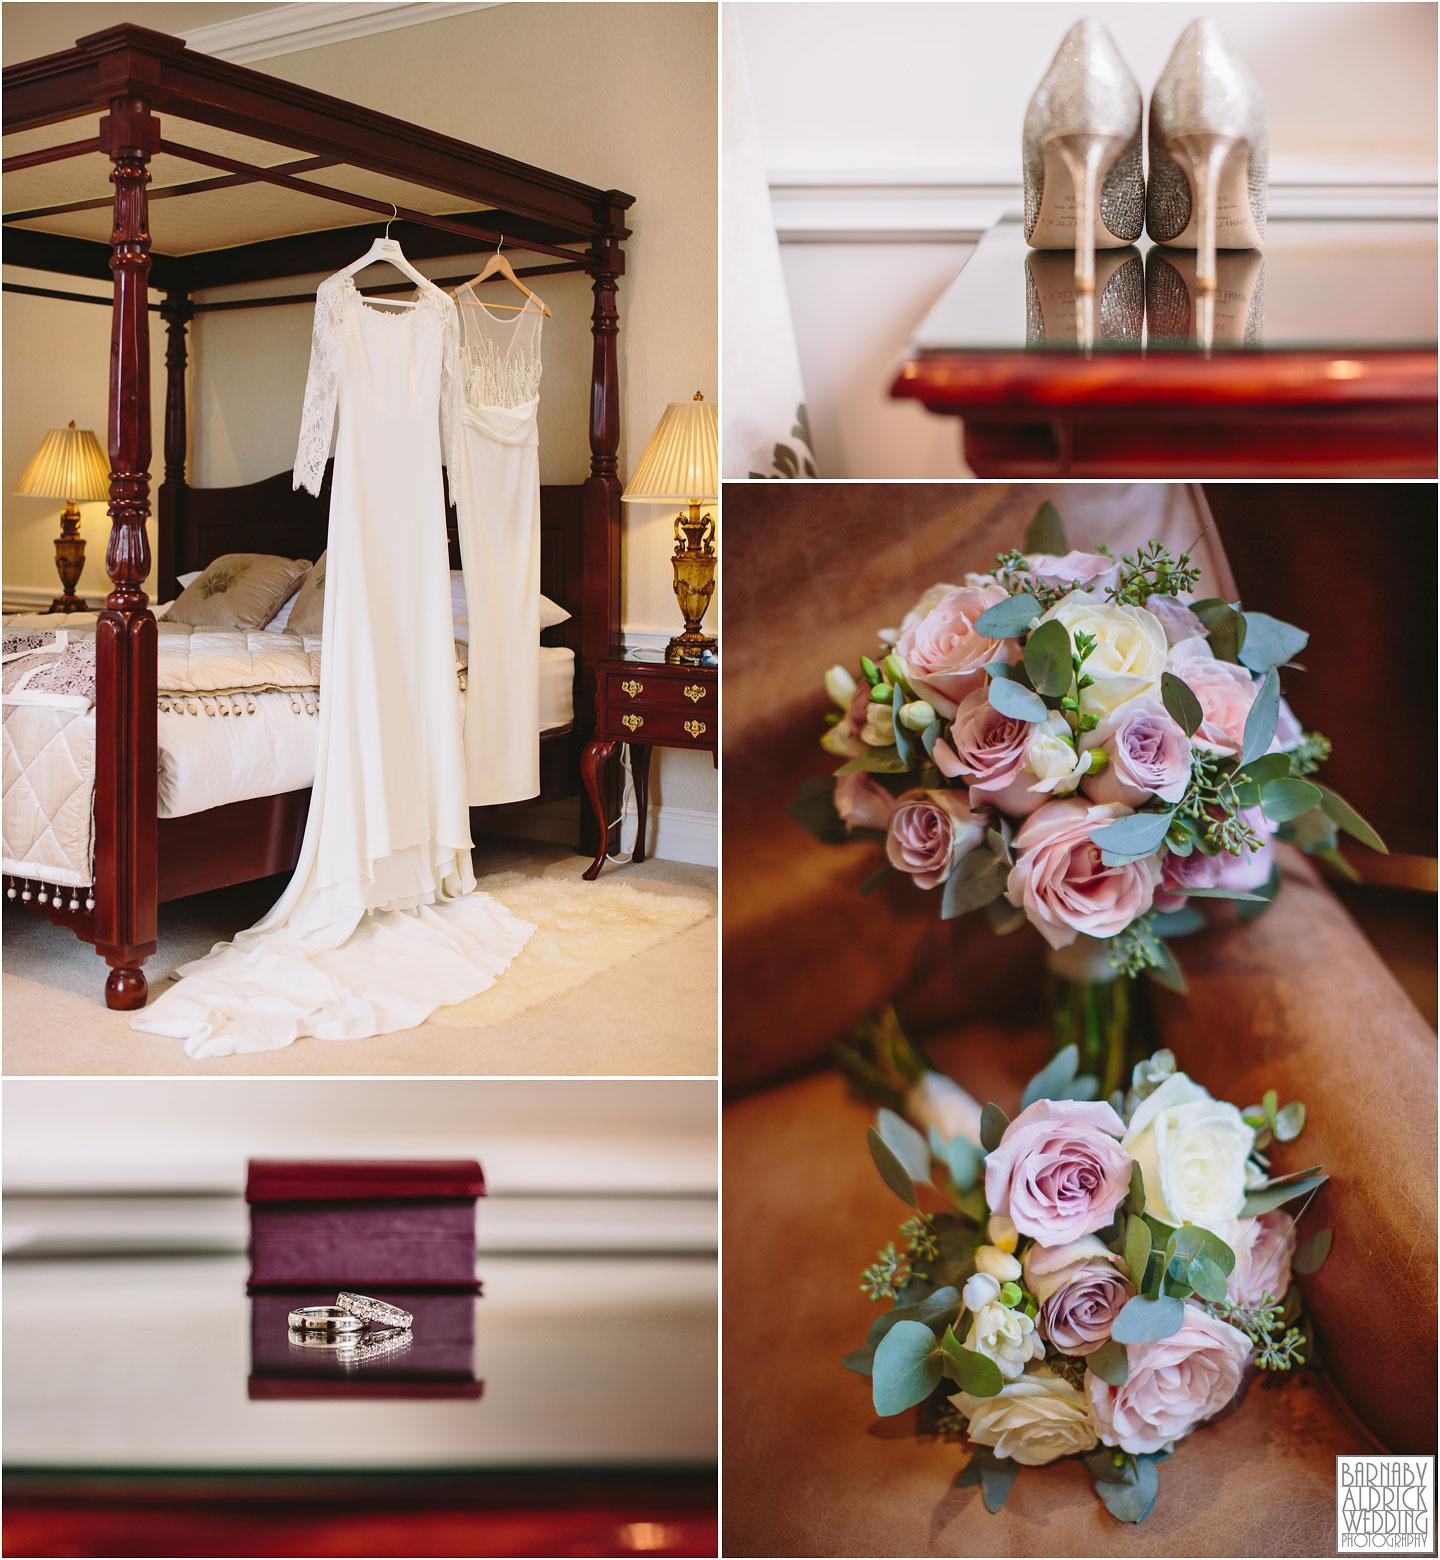 Denton Hall Wedding Photography, Ilkley Yorkshire Wedding Photographer, Yorkshire Country House Wedding, Box Tree Catering, Bridal PA